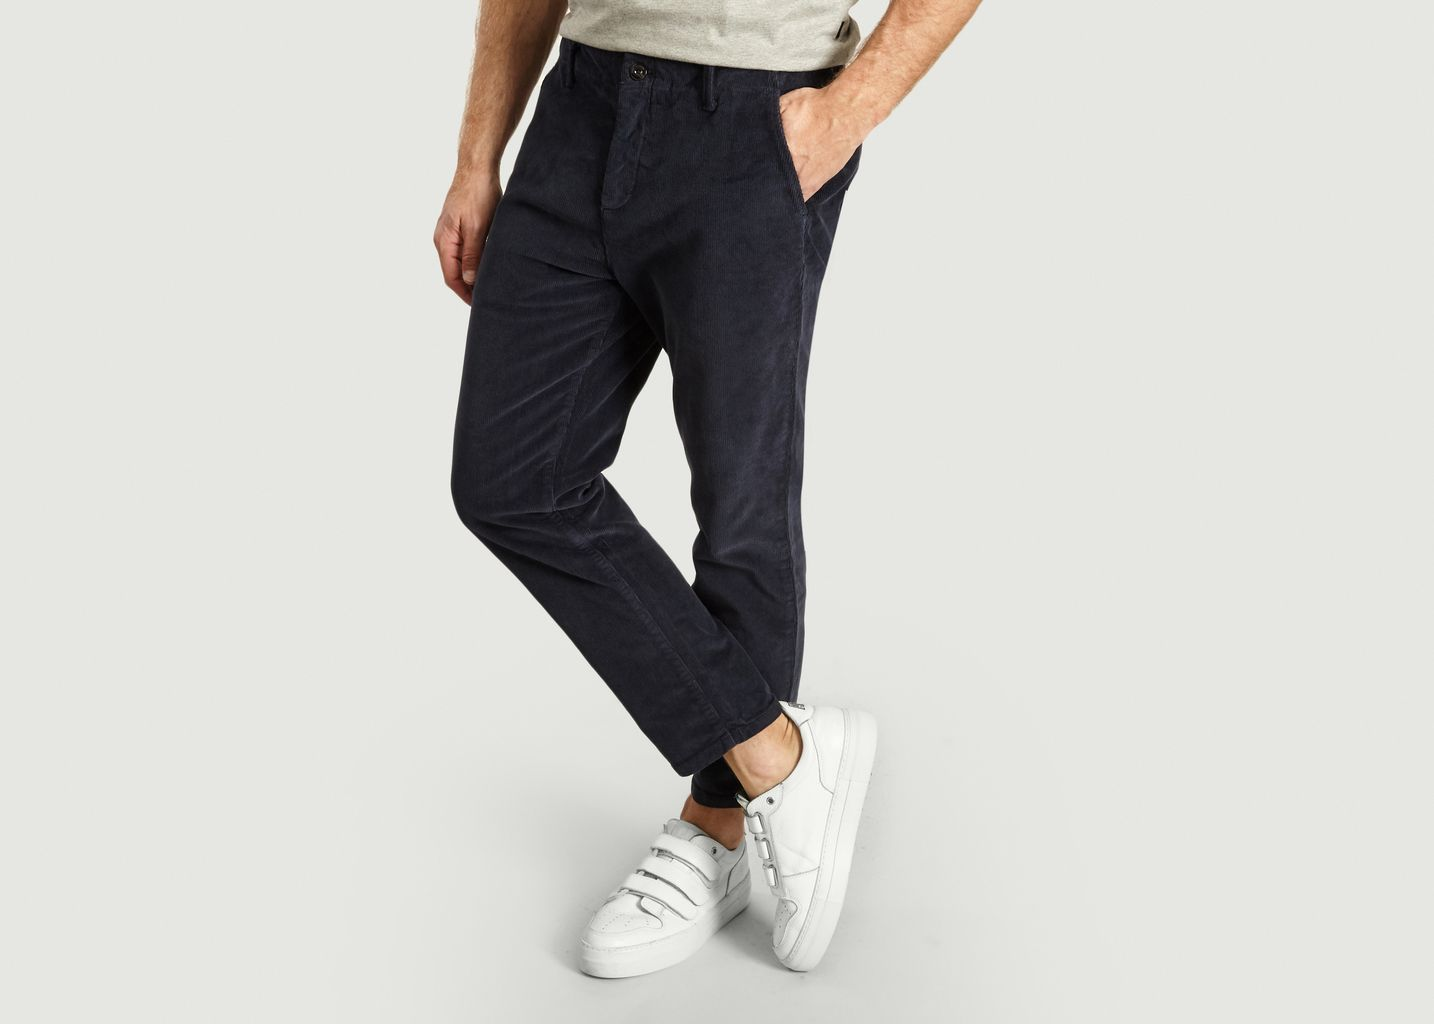 Pantalon Cord - Edmmond Studios